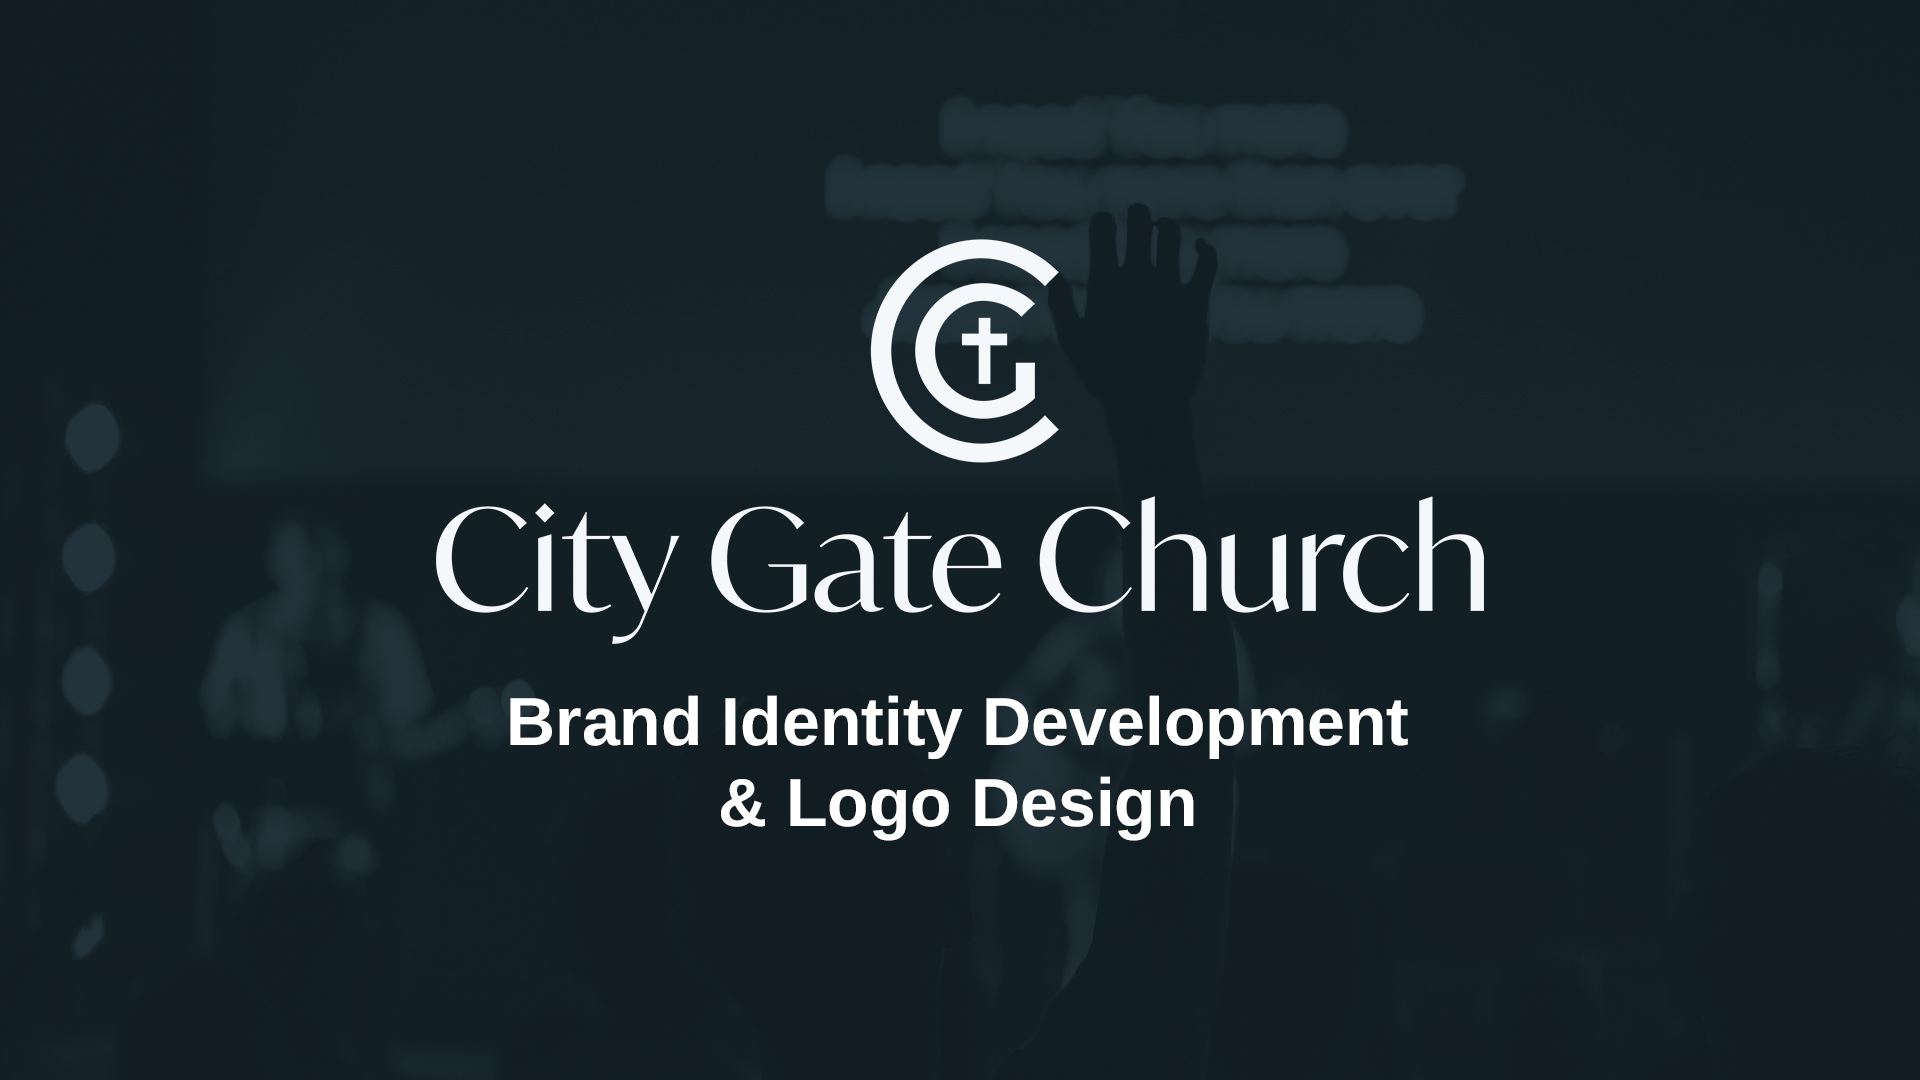 City Gate Church